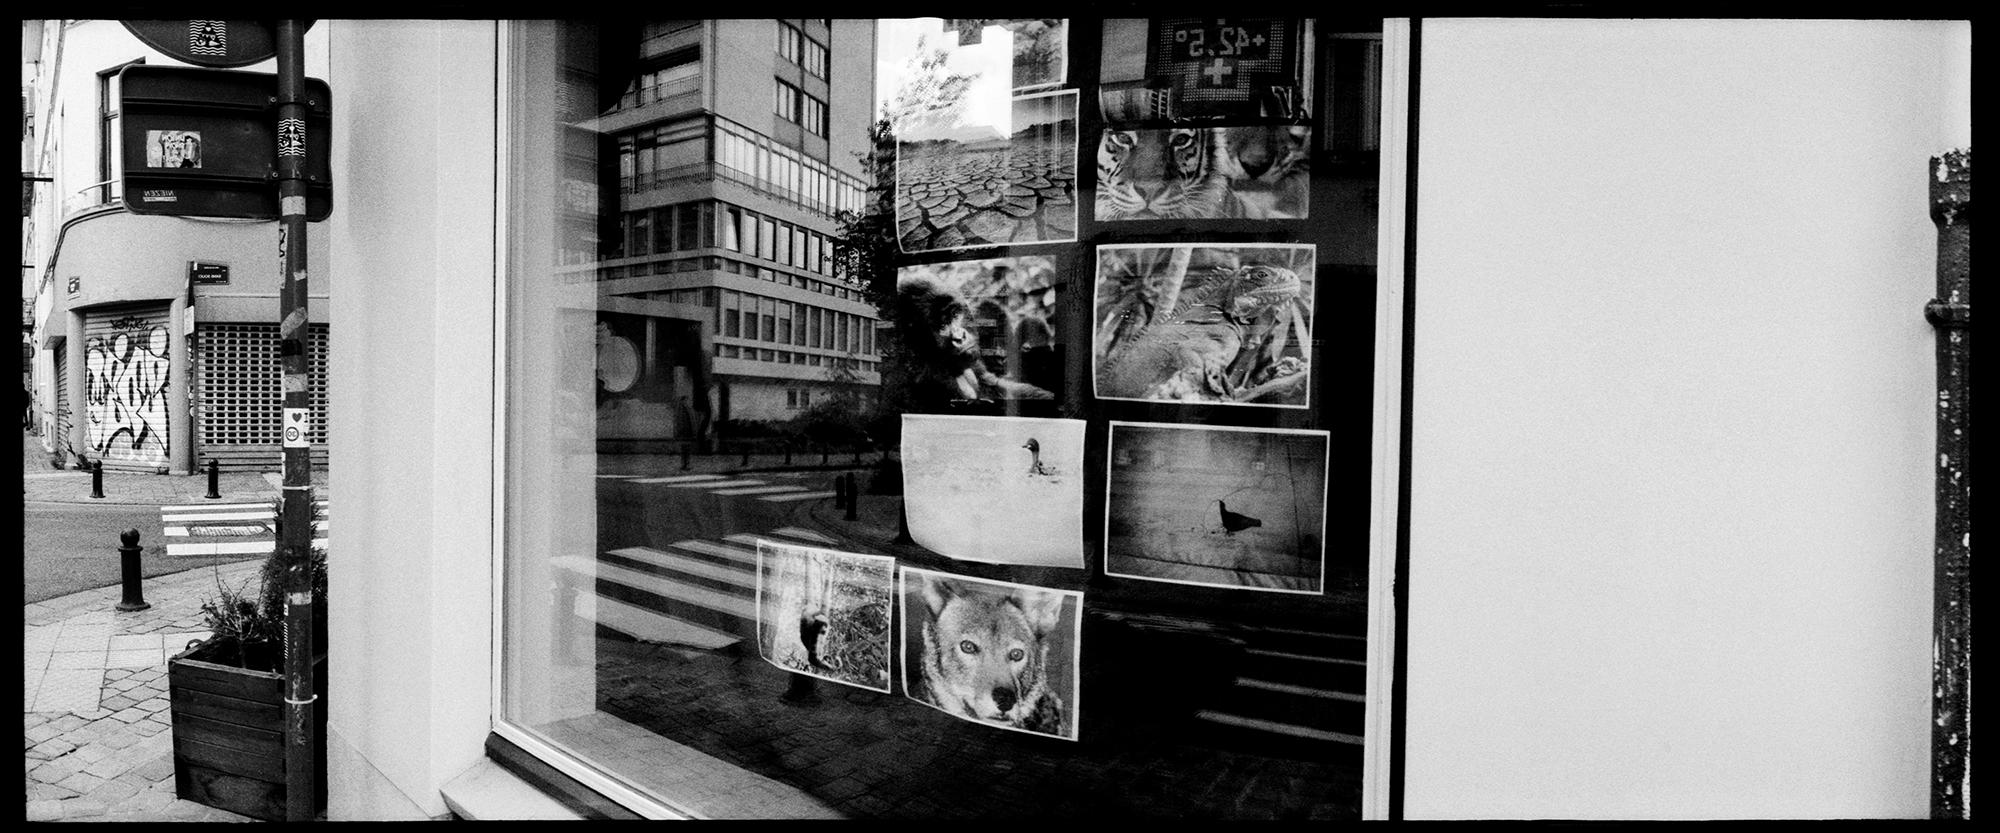 Brussels, Belgium by Laurent Orseau #77